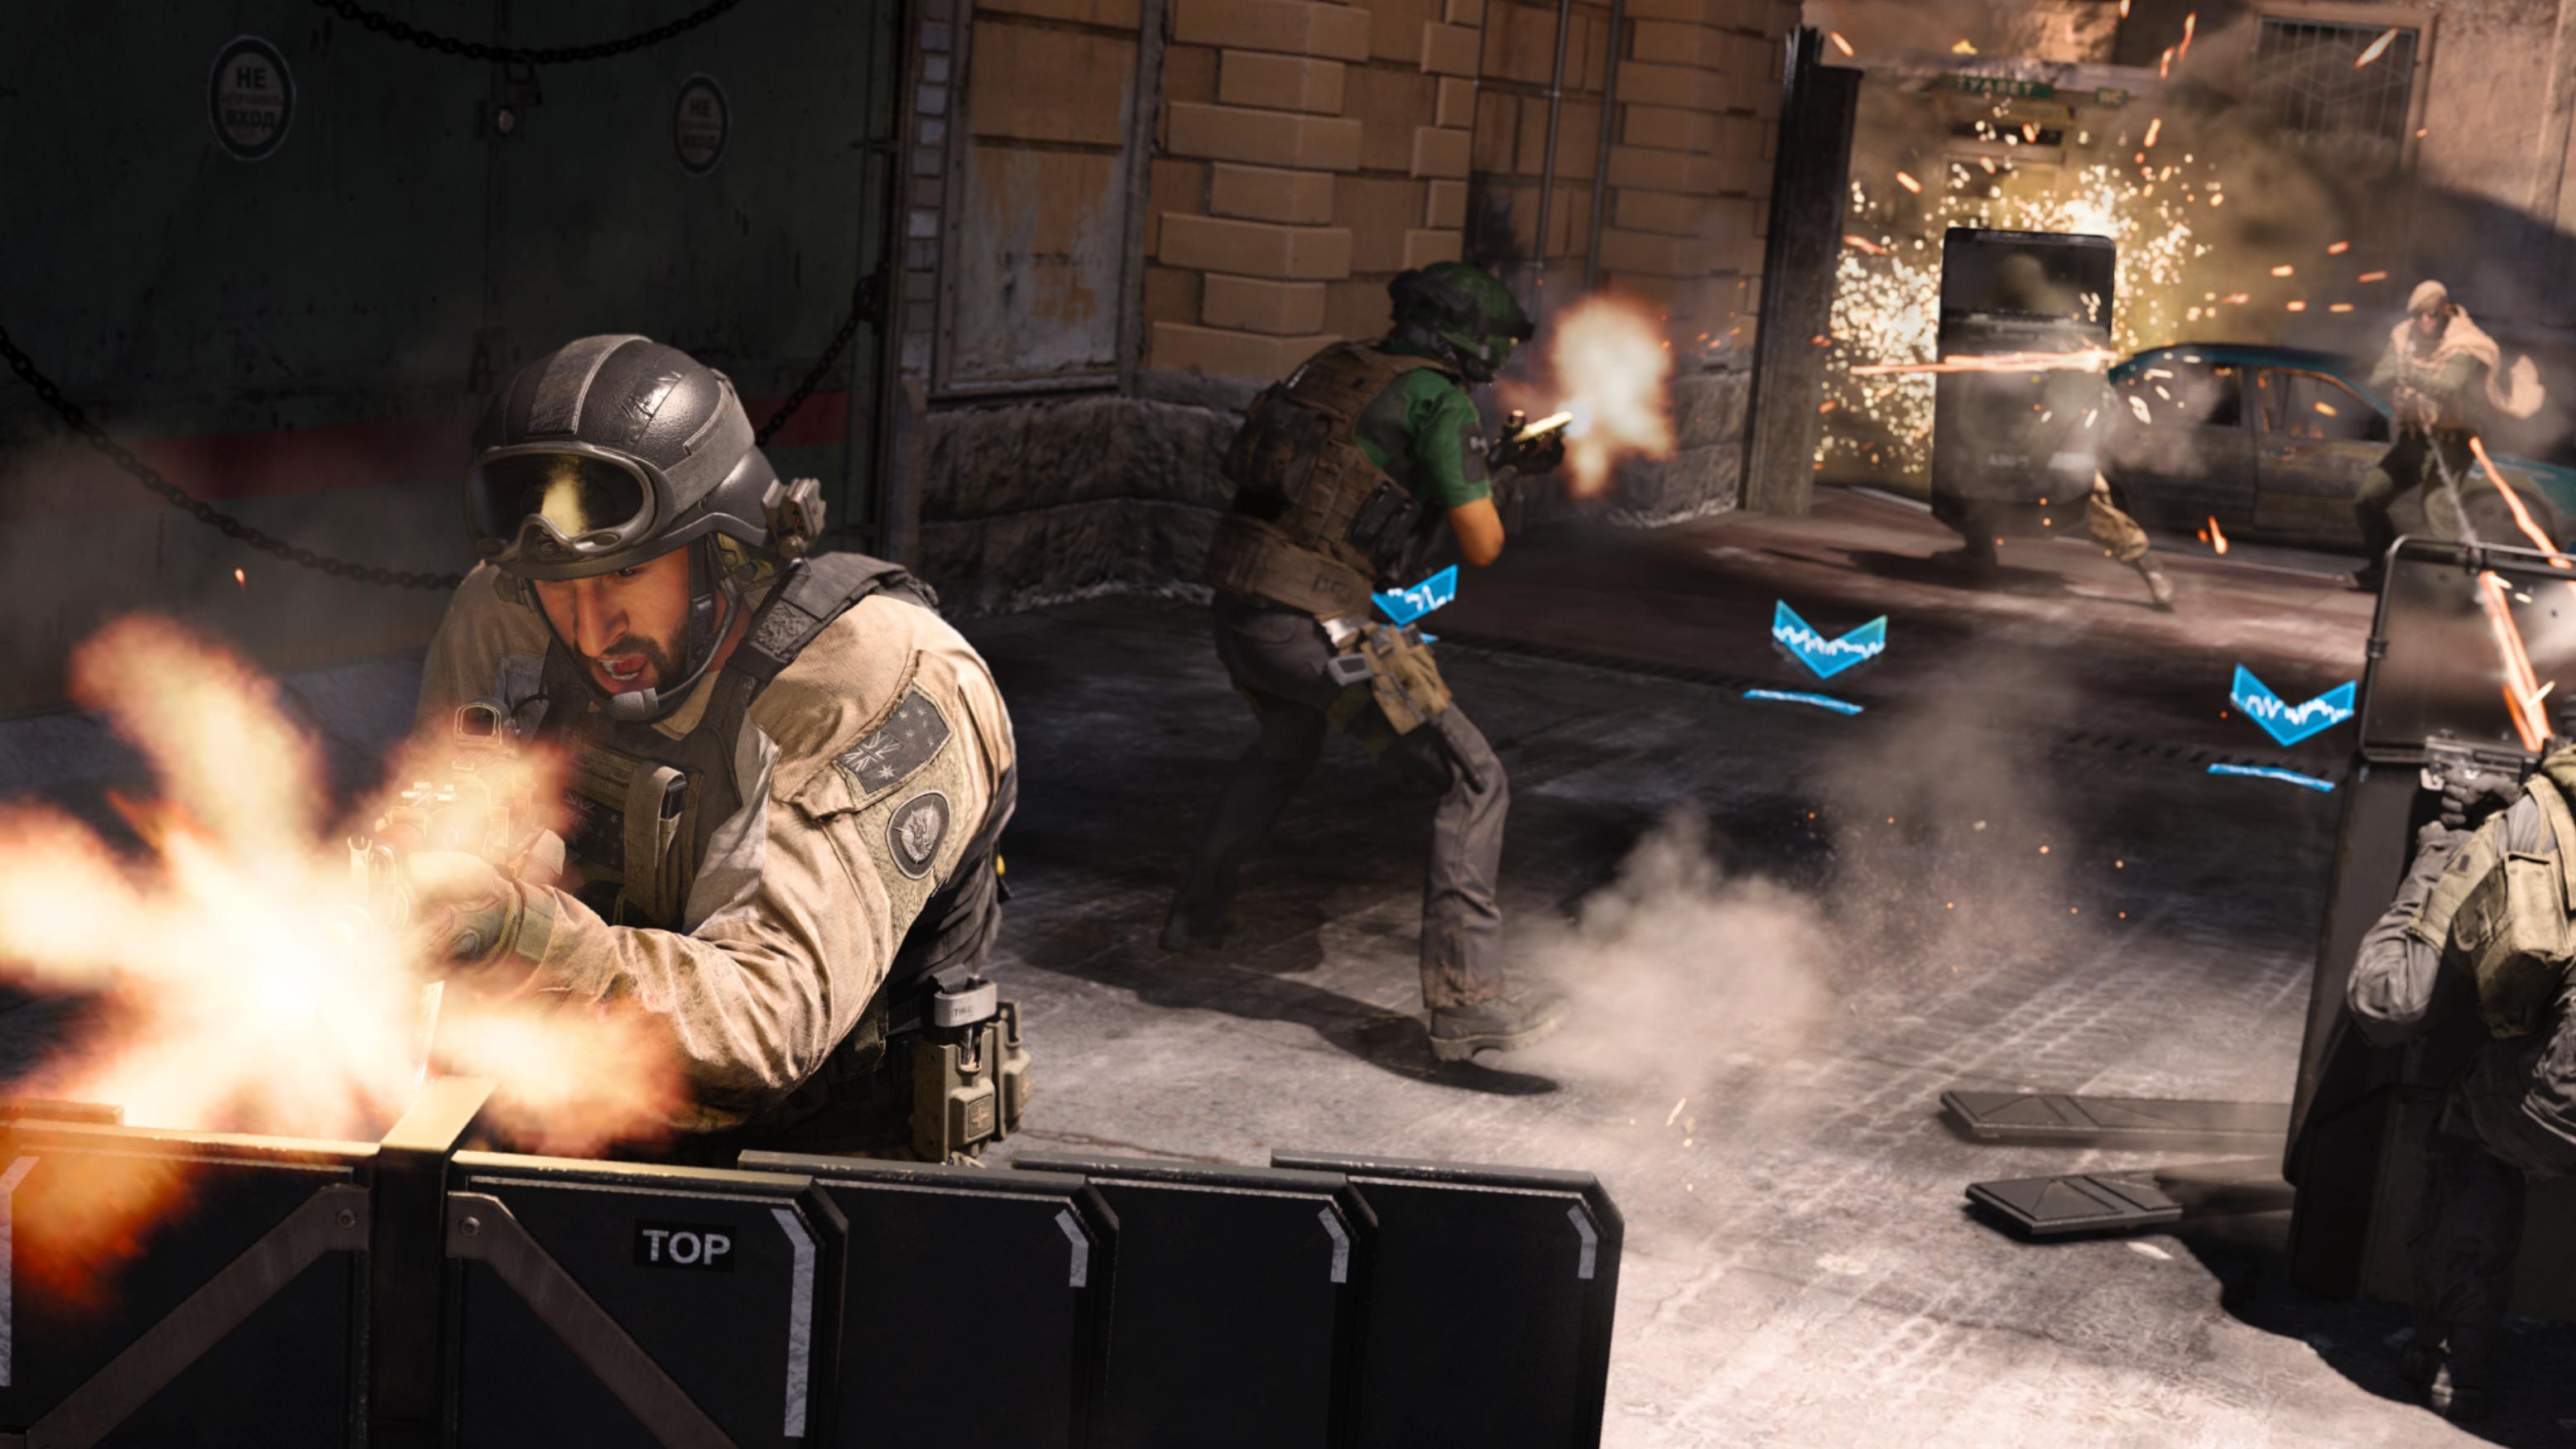 Call Of Duty: Modern Warfare's Camera Angles And Hitboxes Are Still Pretty Broken